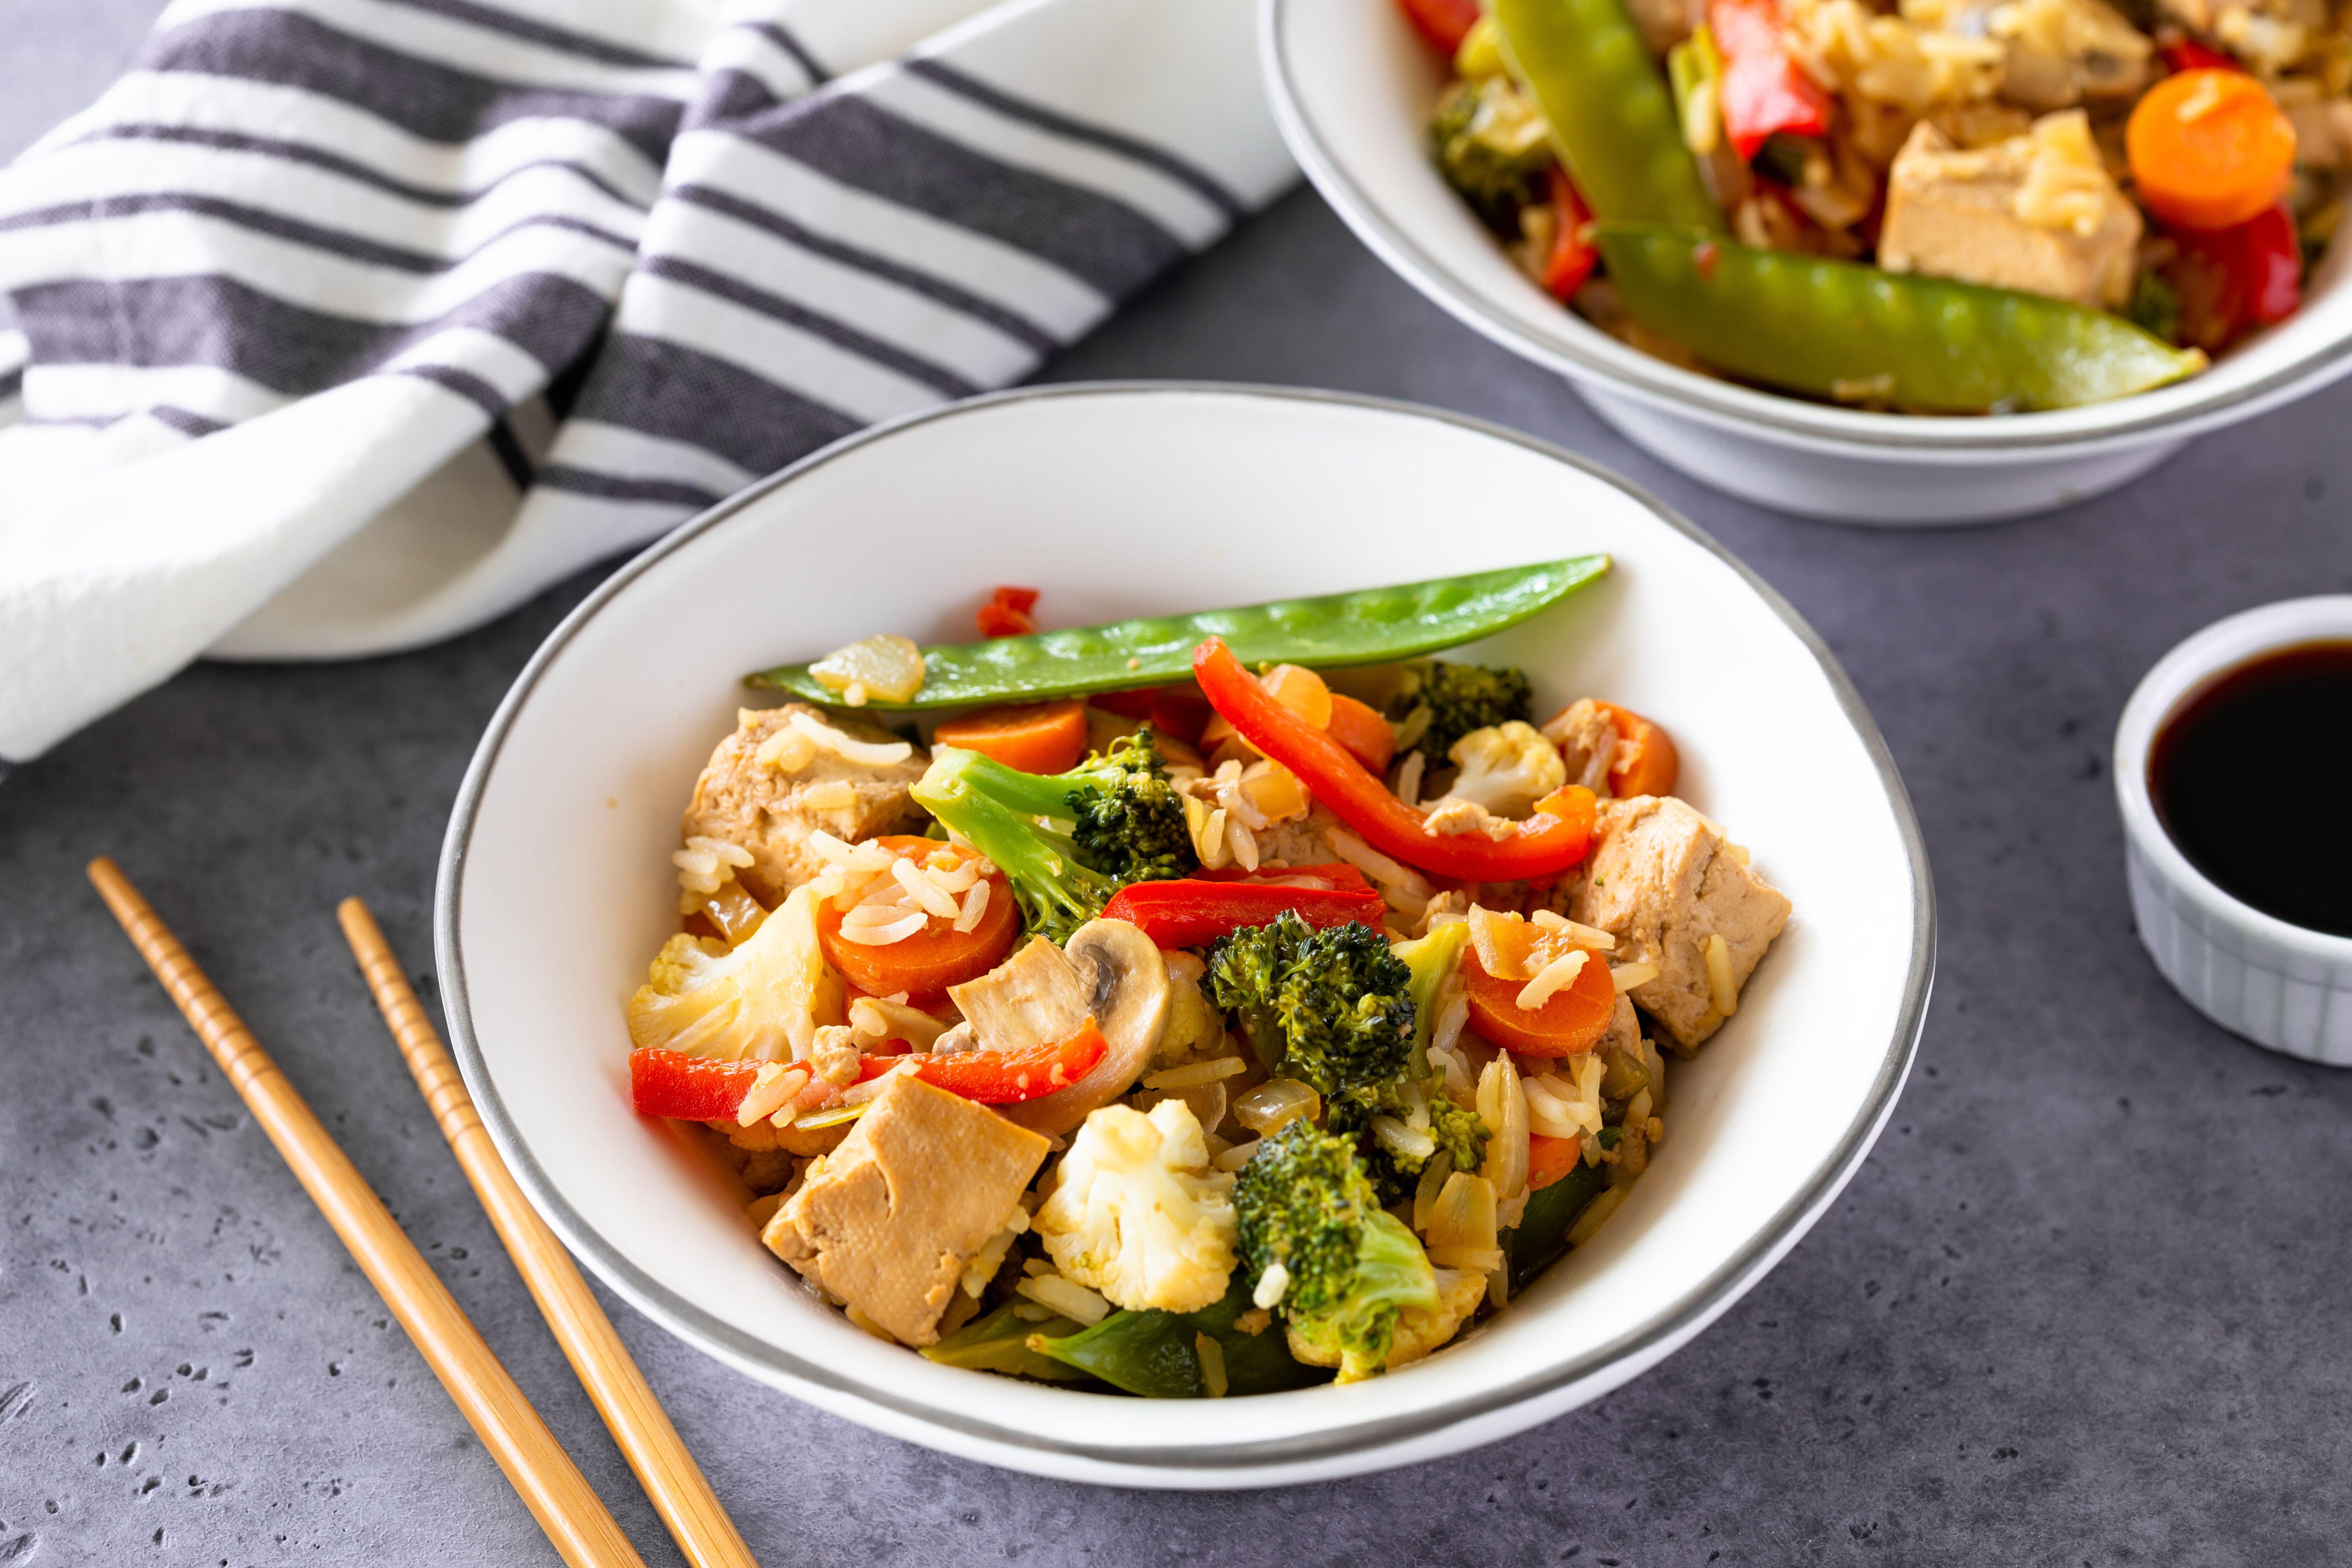 Vegan tofu and vegetable stir fry